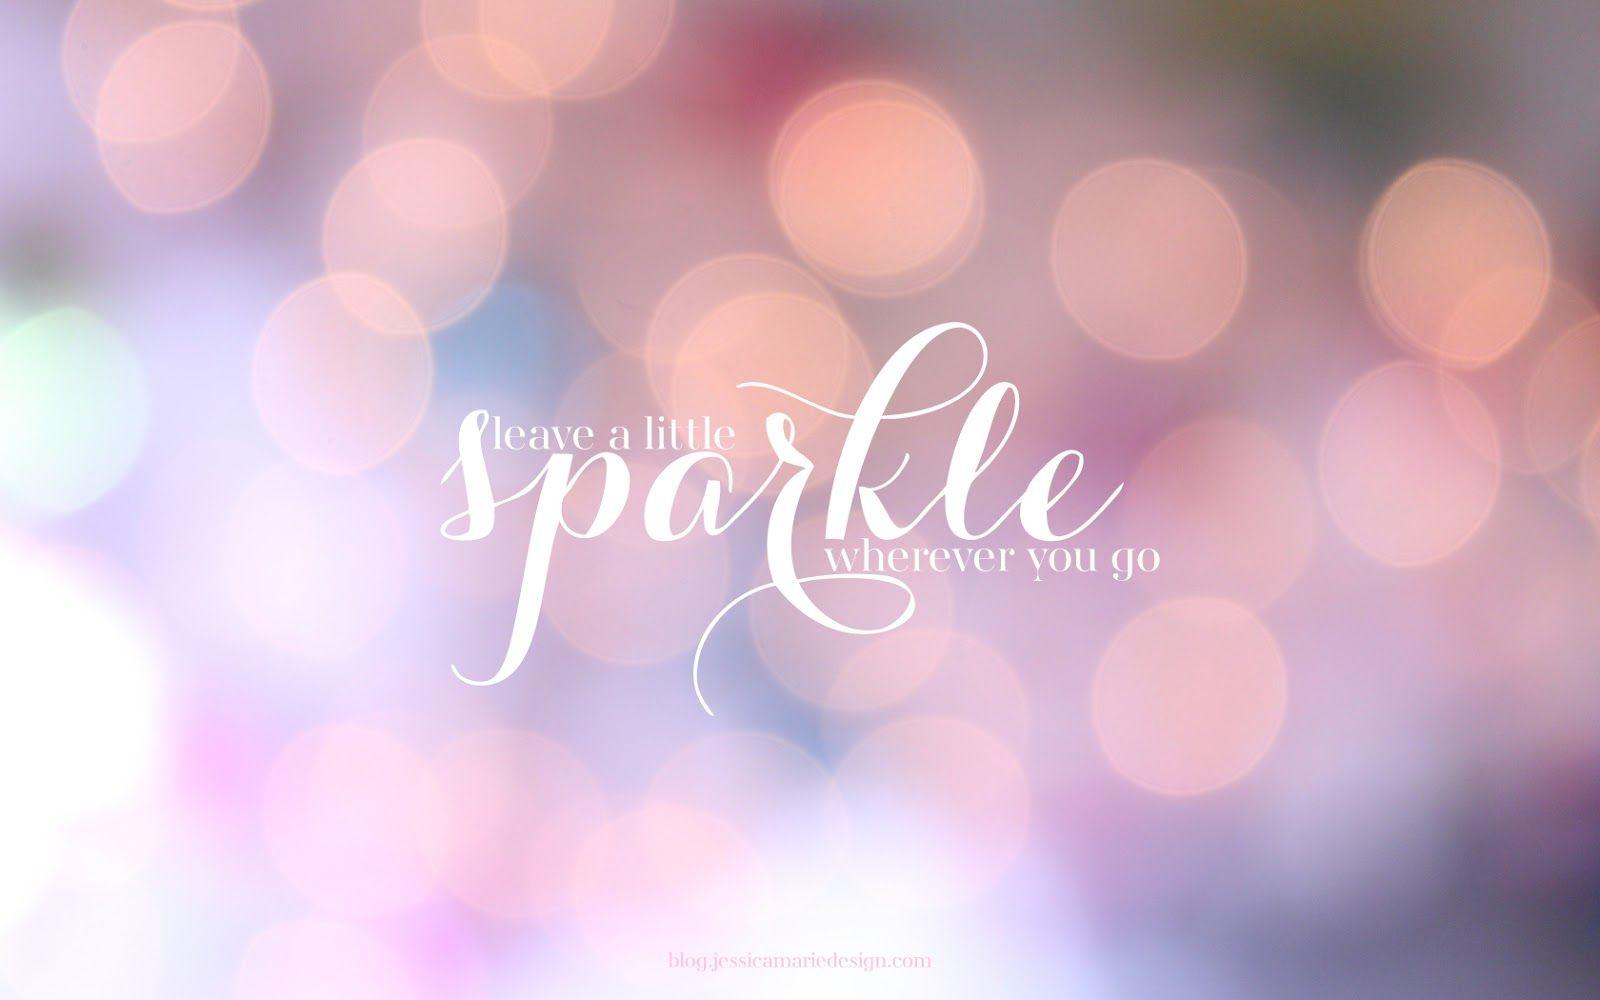 Dress your Tech: Leave a little sparkle wherever you go